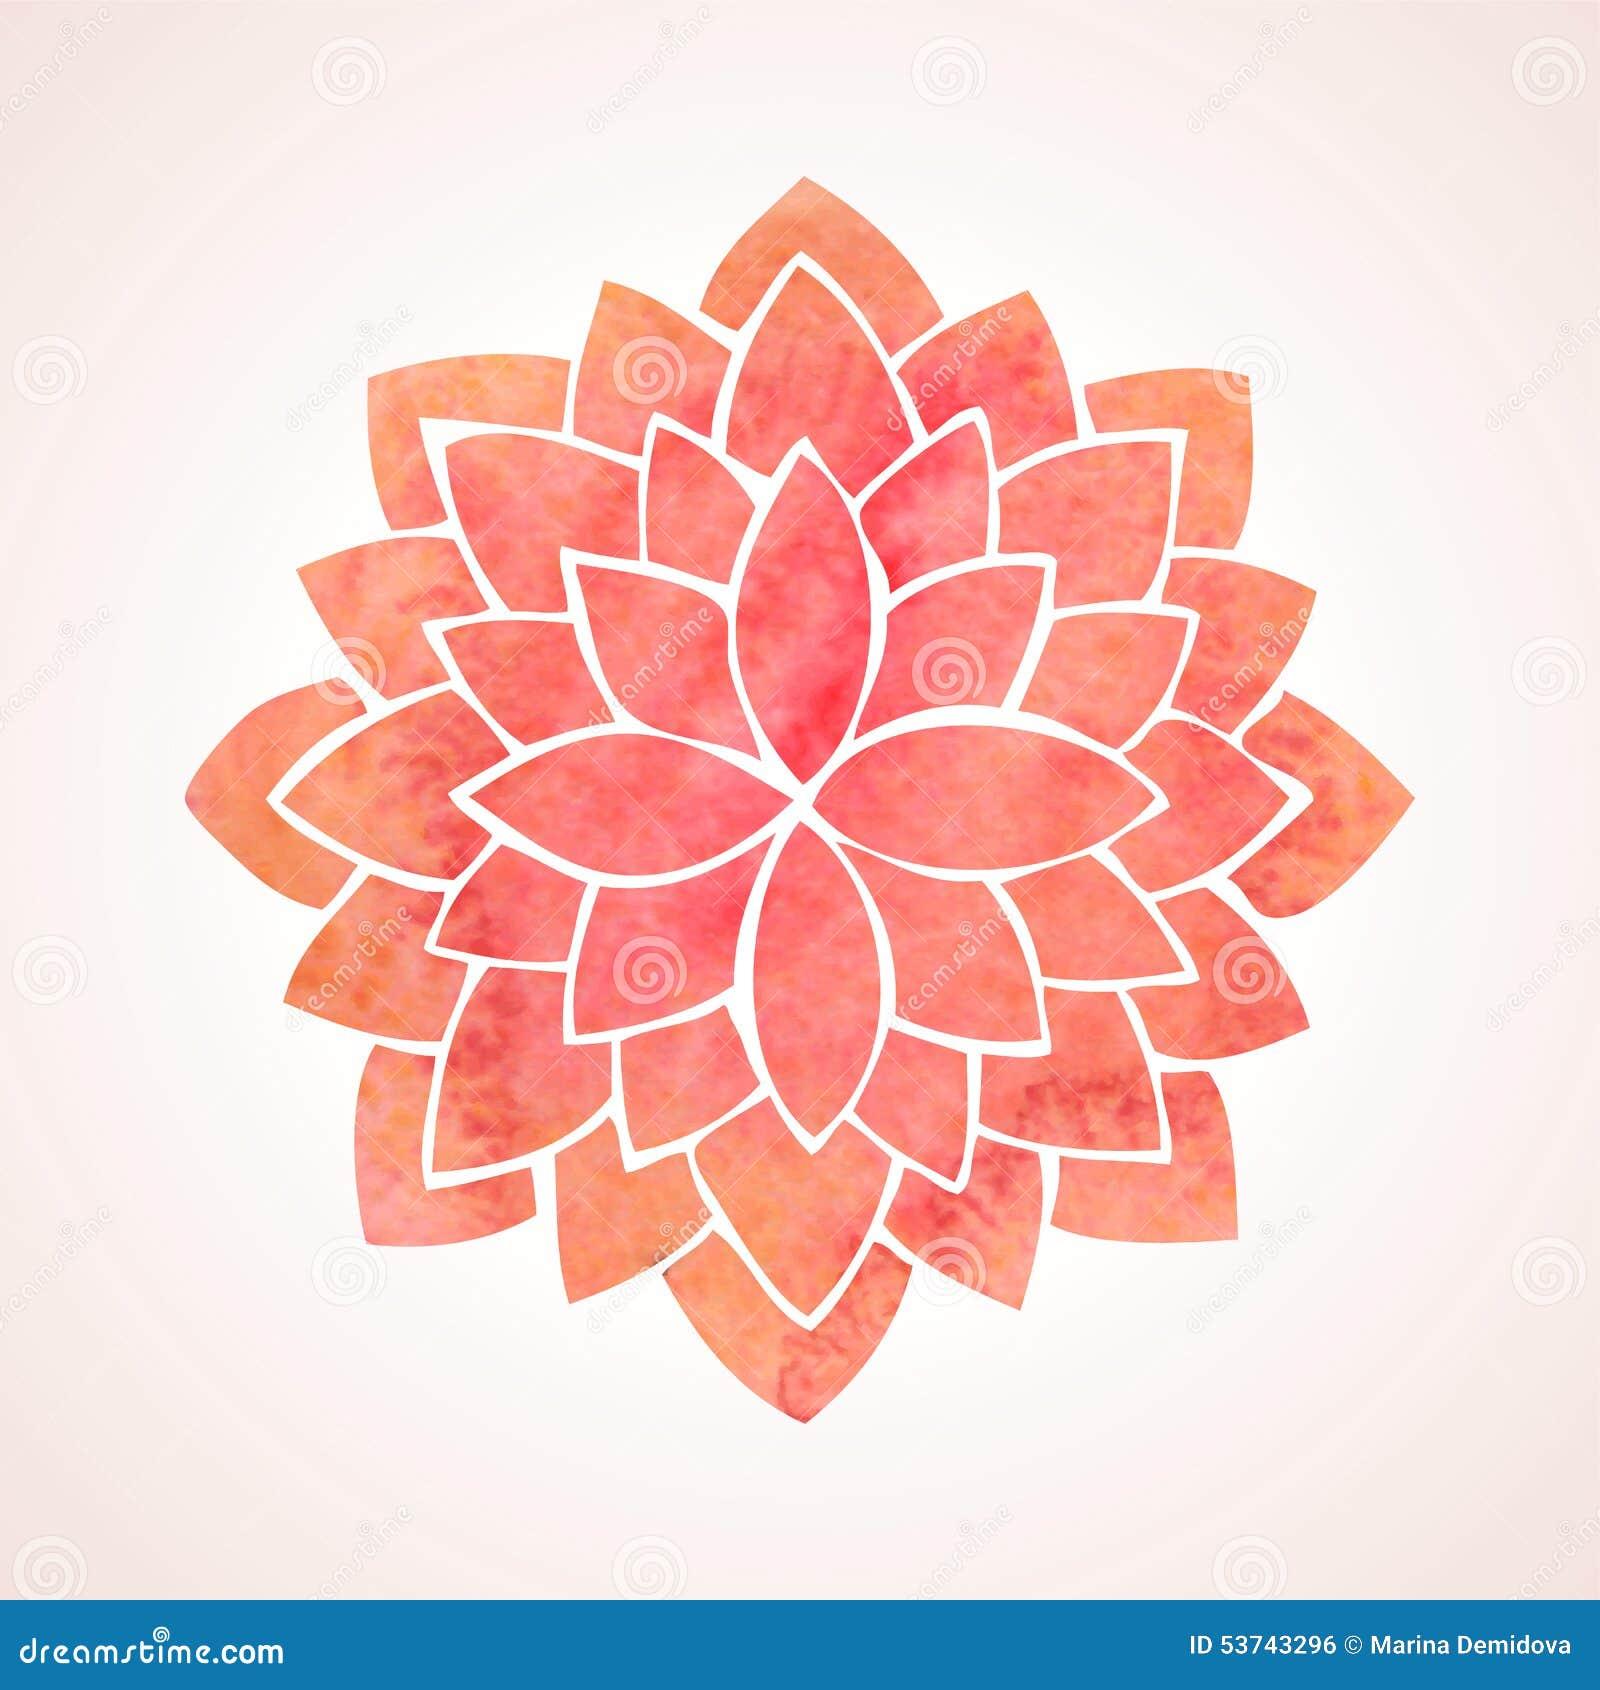 floral designs patterns for cards